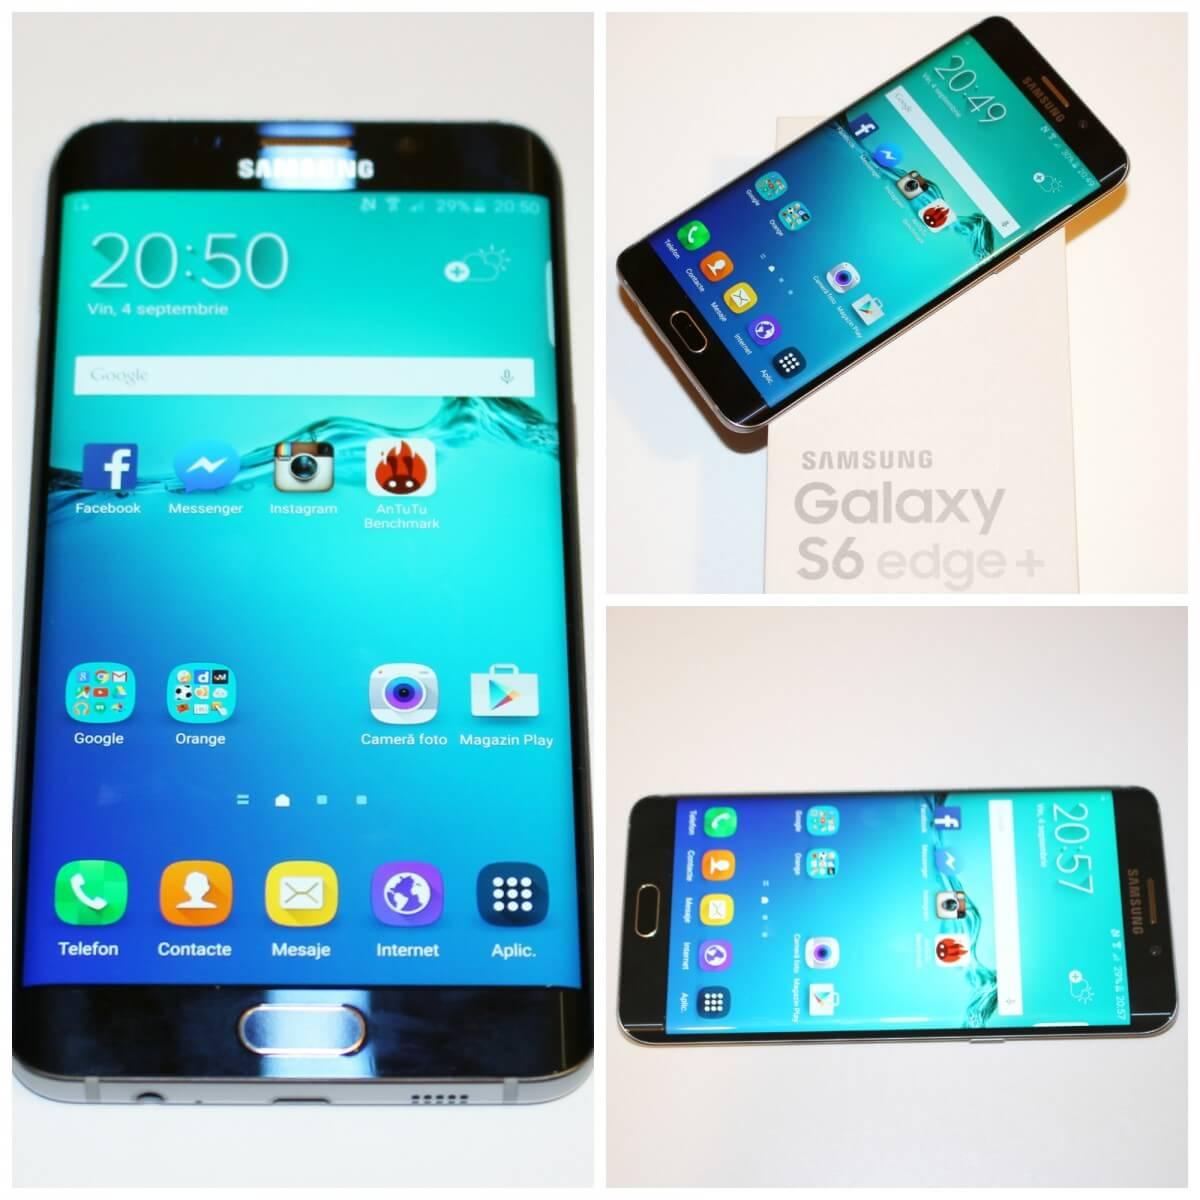 Samsung Galaxy S6 Edge+ (11)